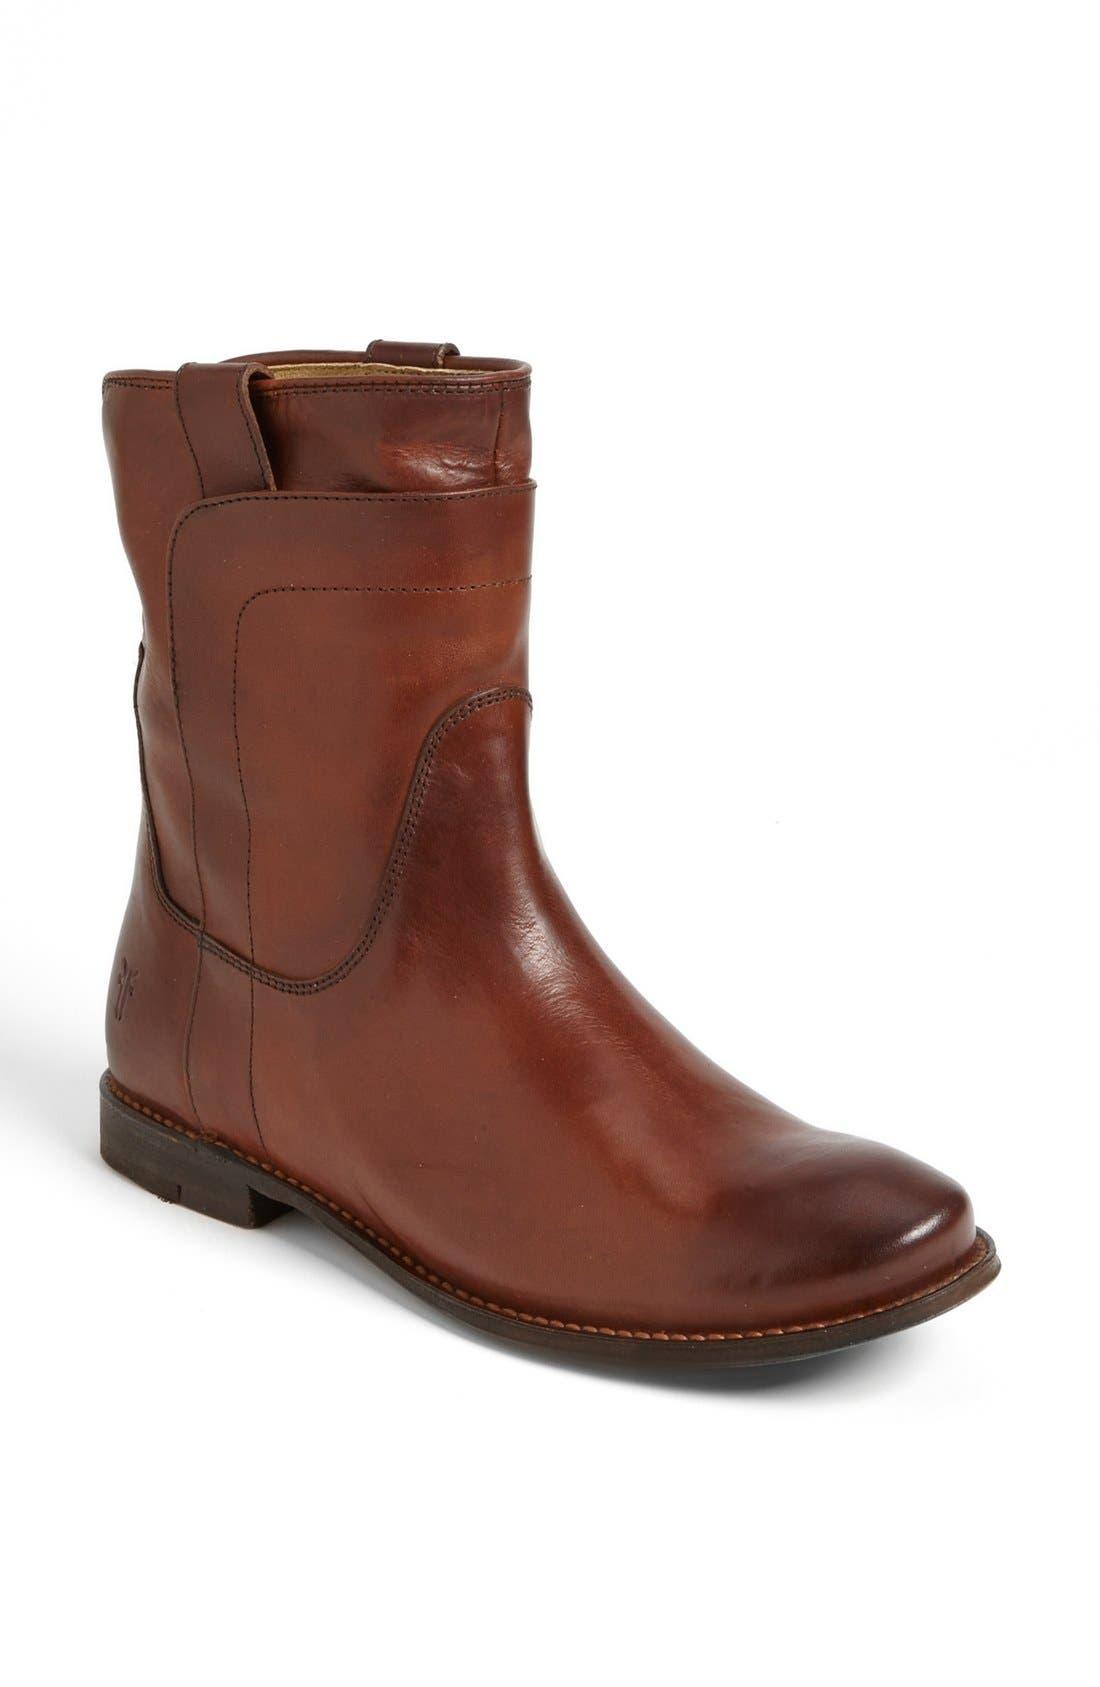 Main Image - Frye 'Paige' Short Boot